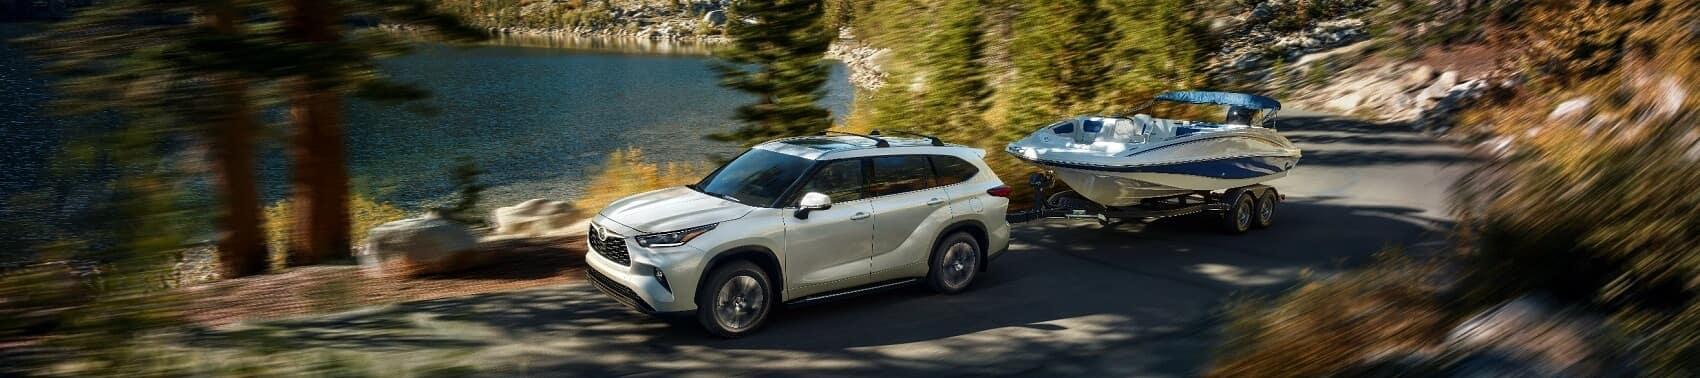 Toyota Highlander for sale Grafton MA